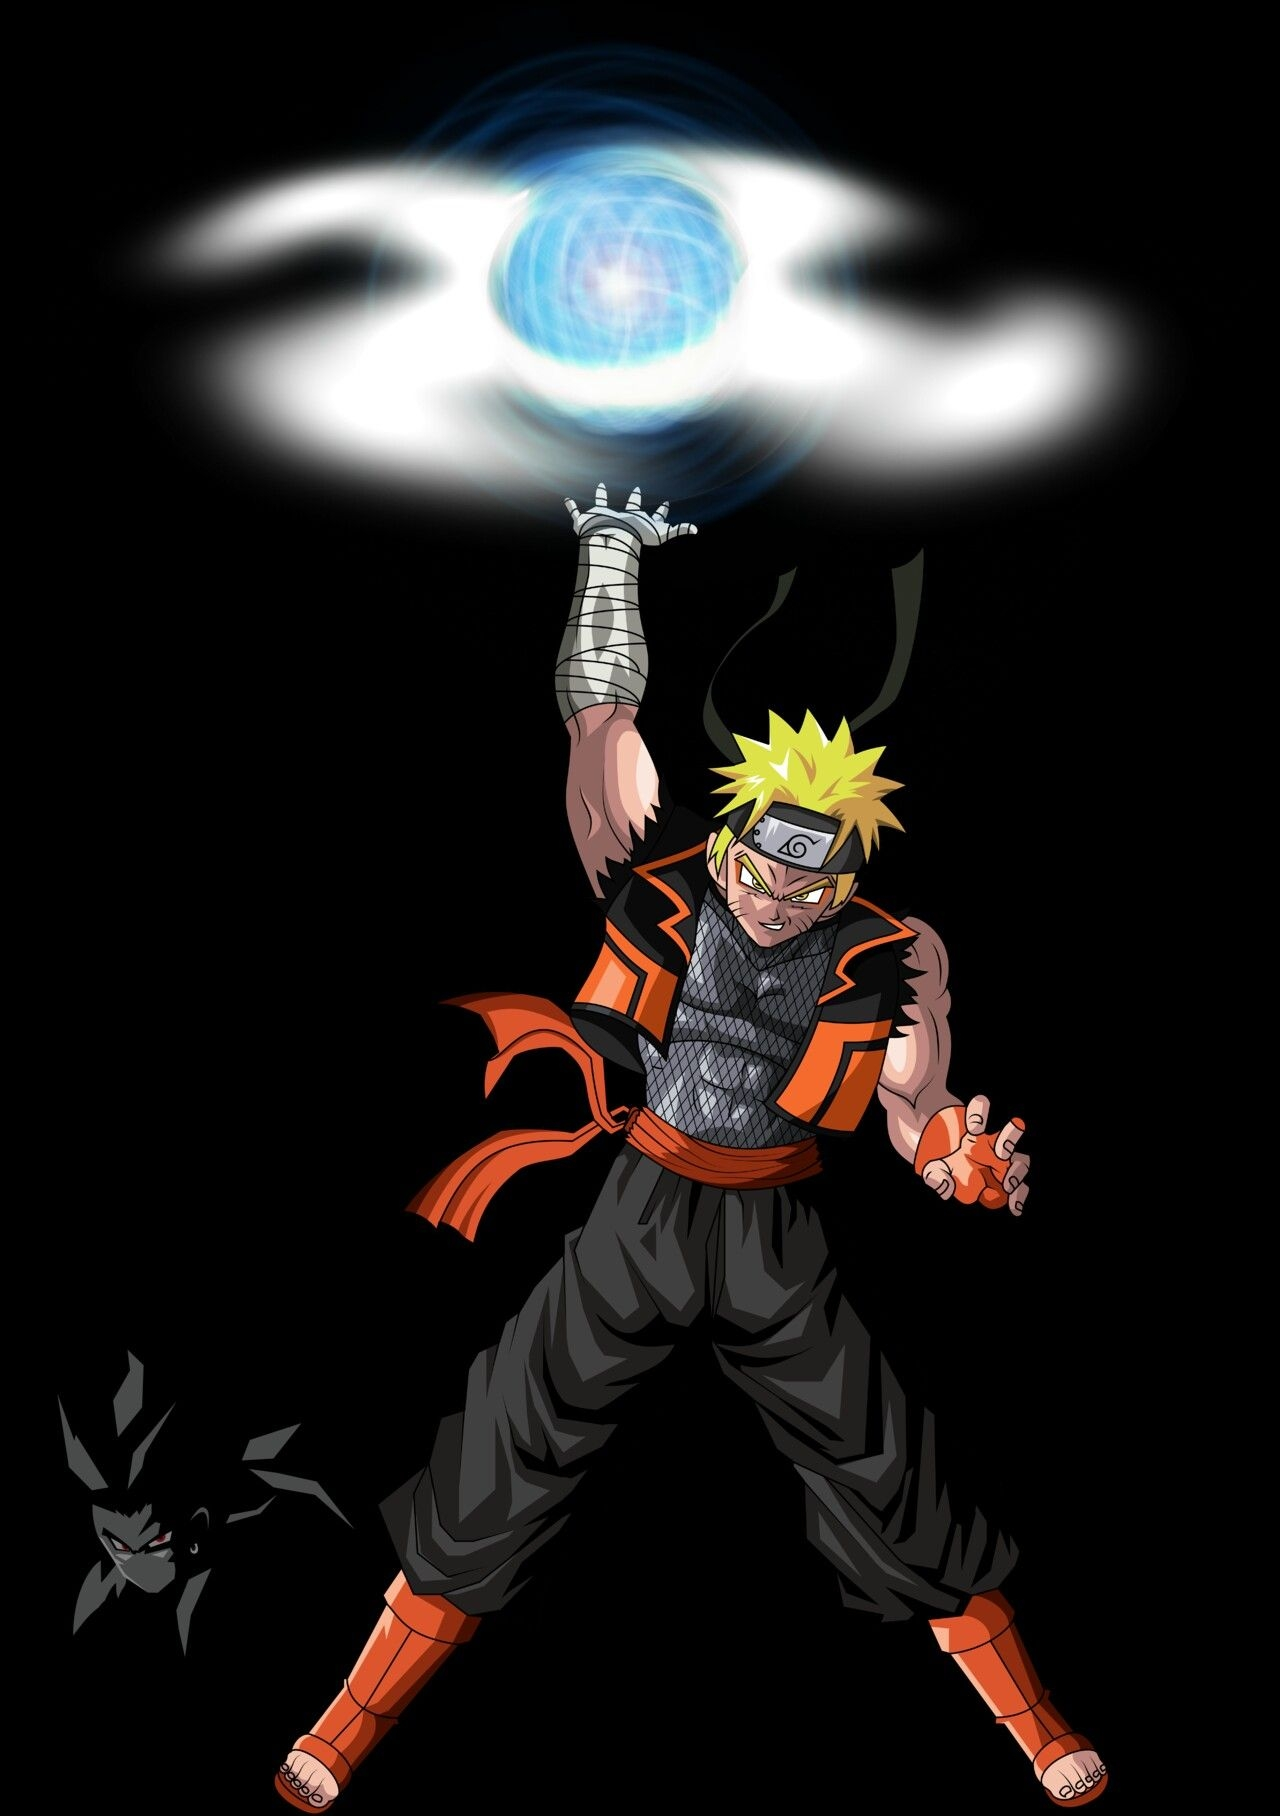 Beautiful Supreme Naruto Anime Anime Wallpaper